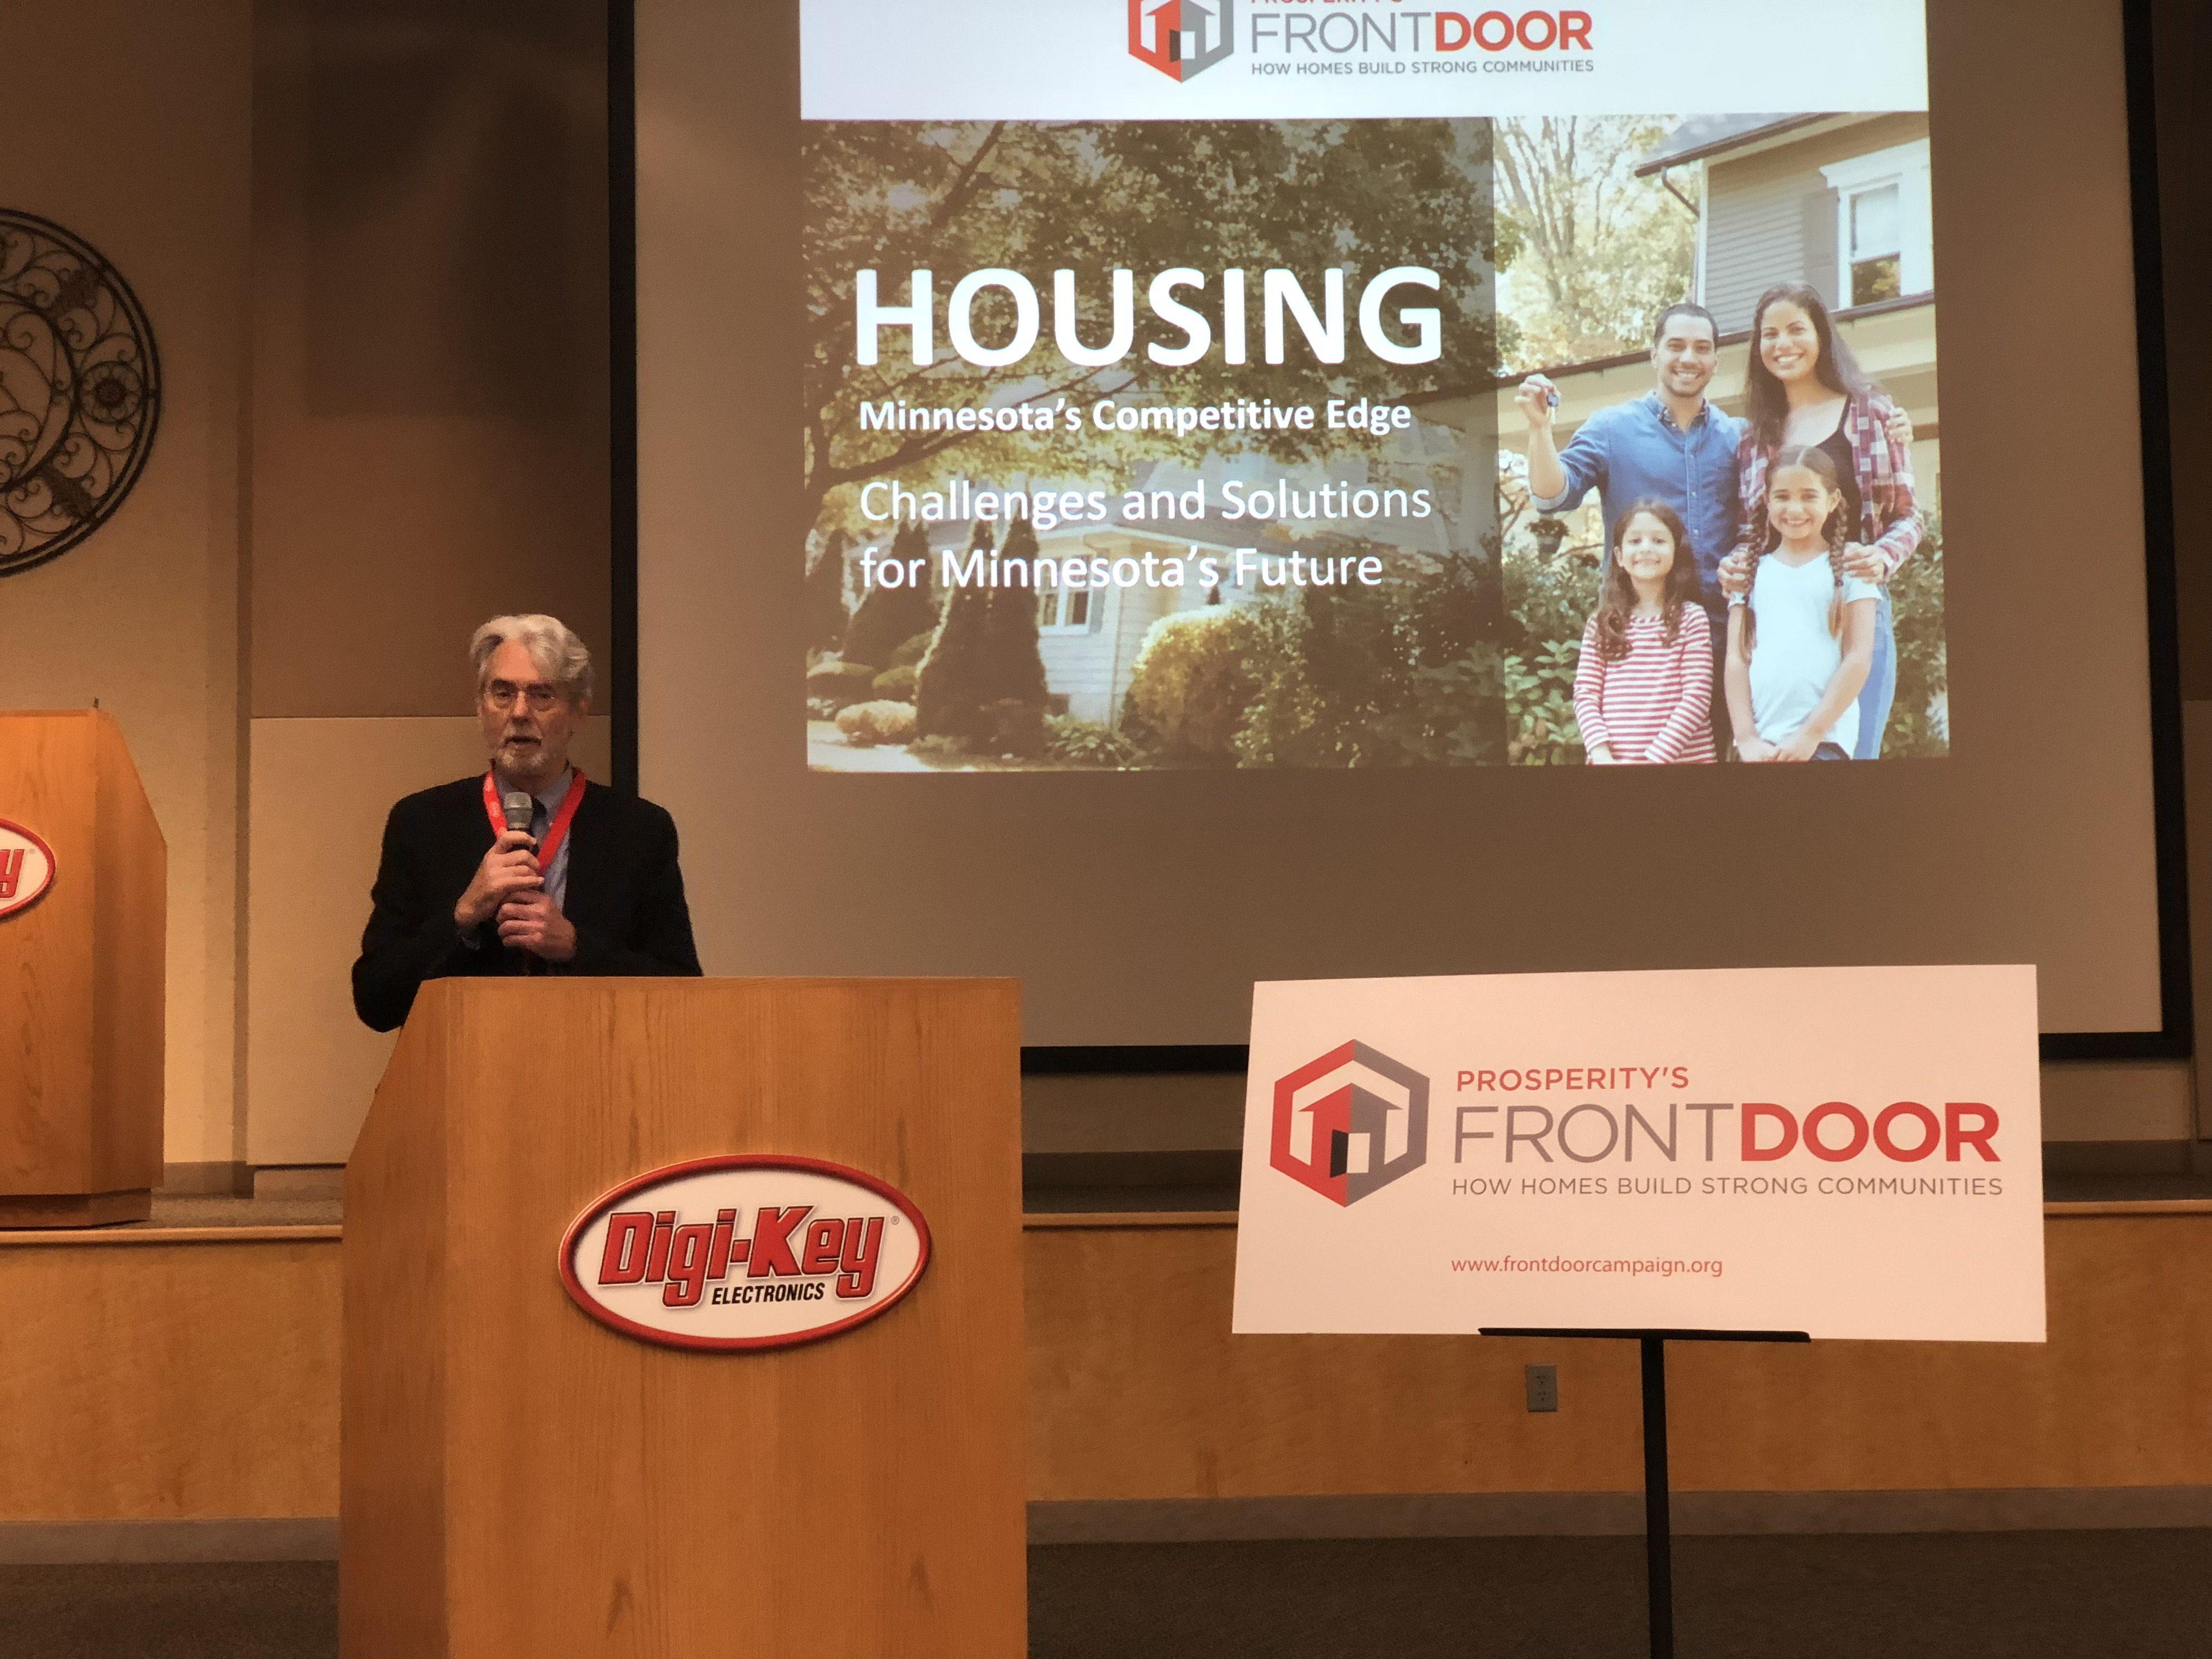 Warren Hanson, President, Greater Minnesota Housing Fund